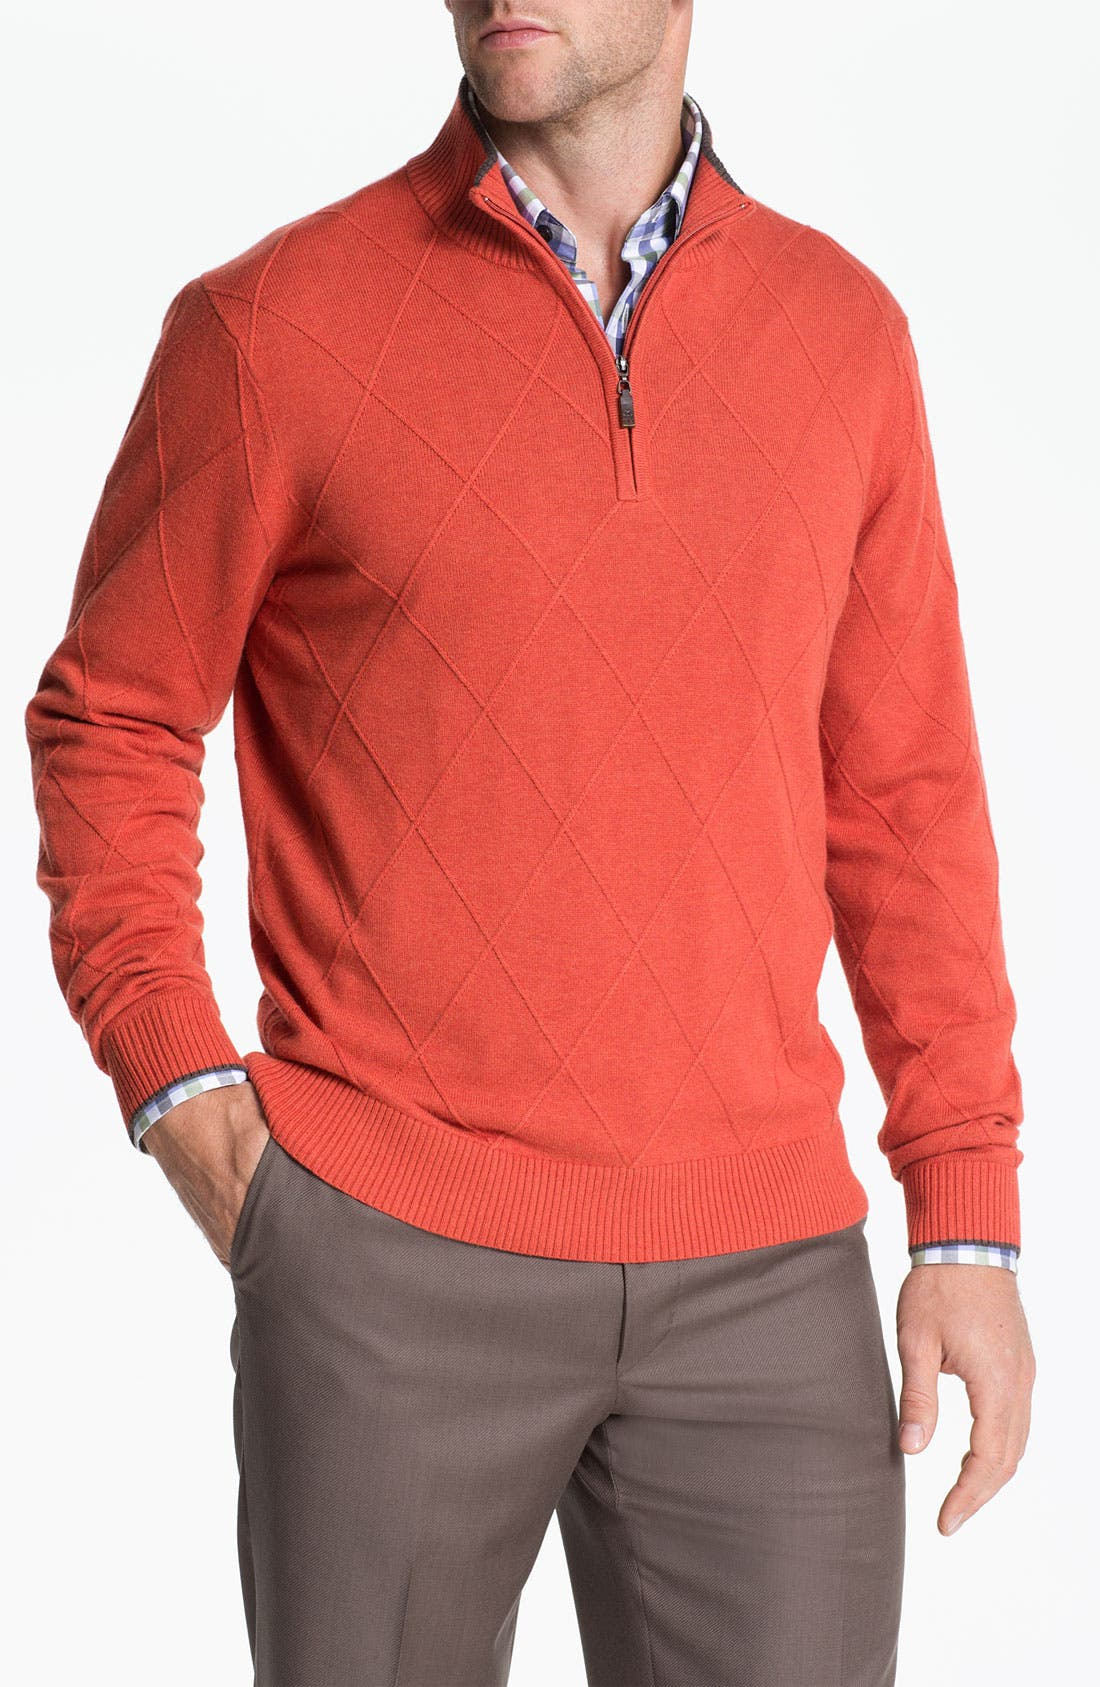 Main Image - Robert Talbott Cotton & Cashmere Quarter Zip Sweater